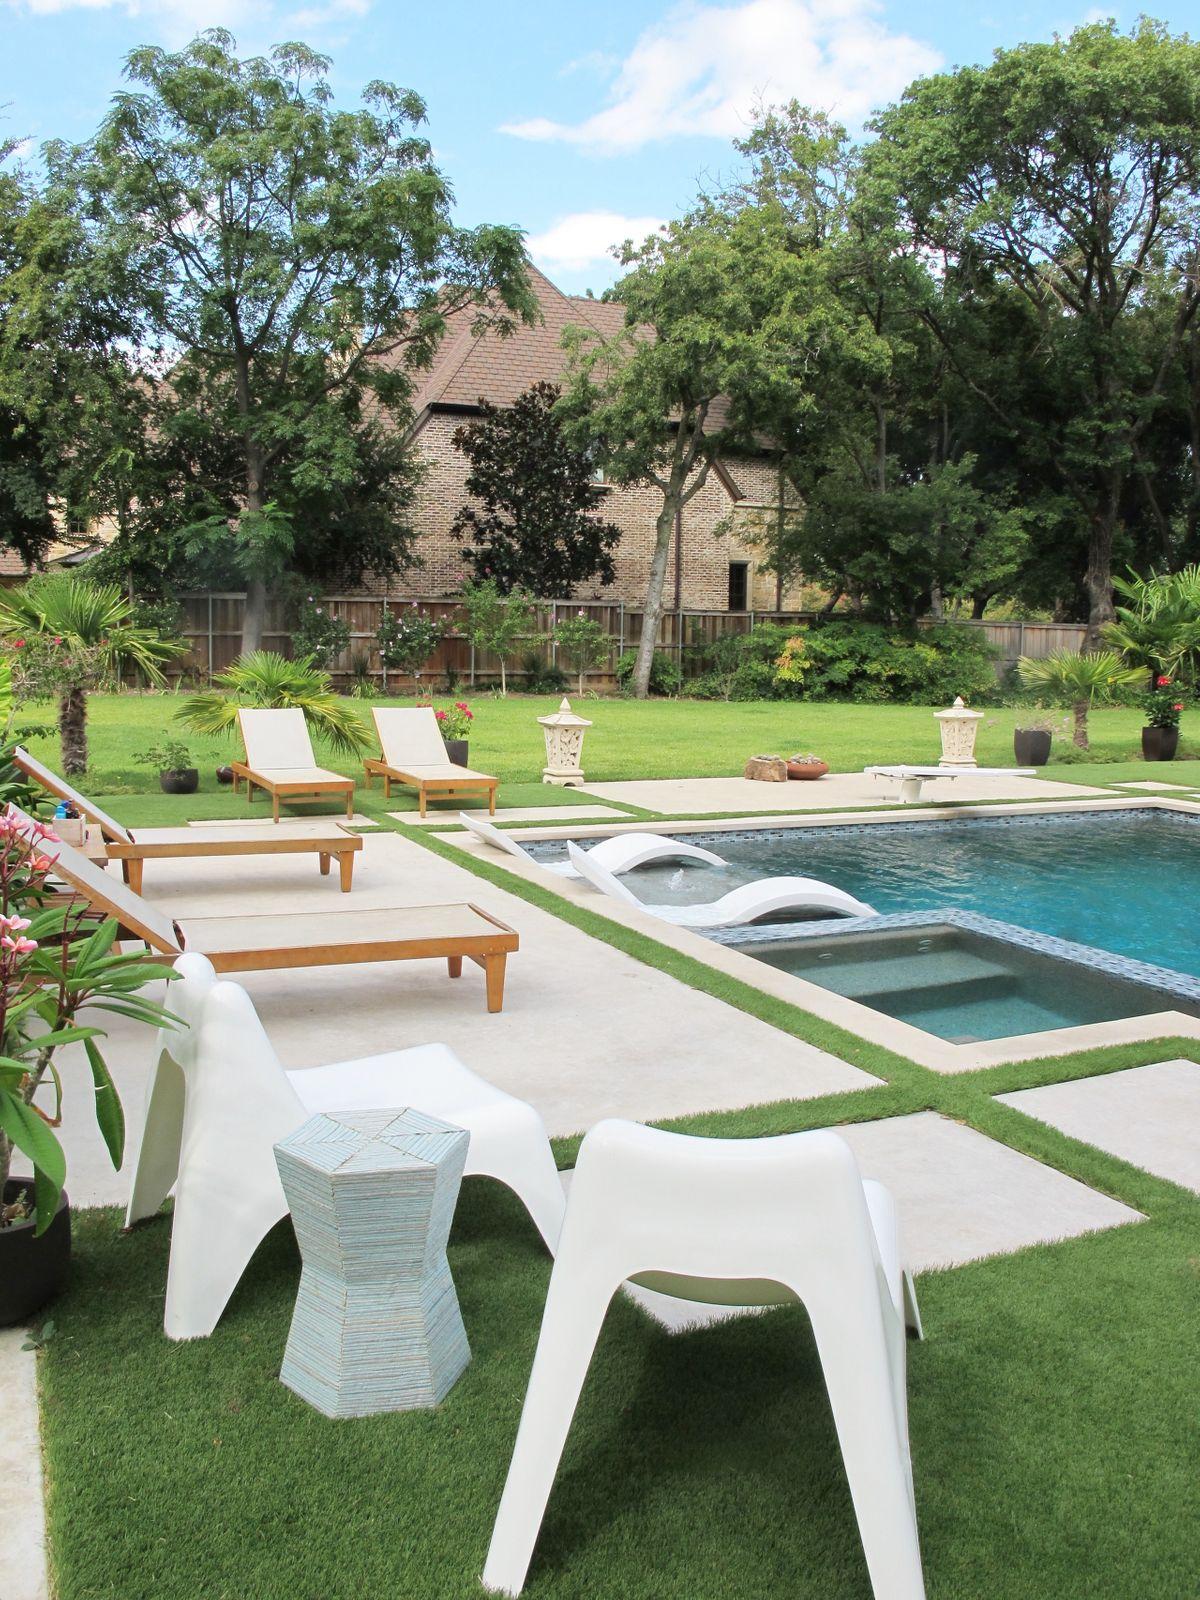 Cindy Mediterranean Home Photo Video Shoot Location Dallas 04.jpg